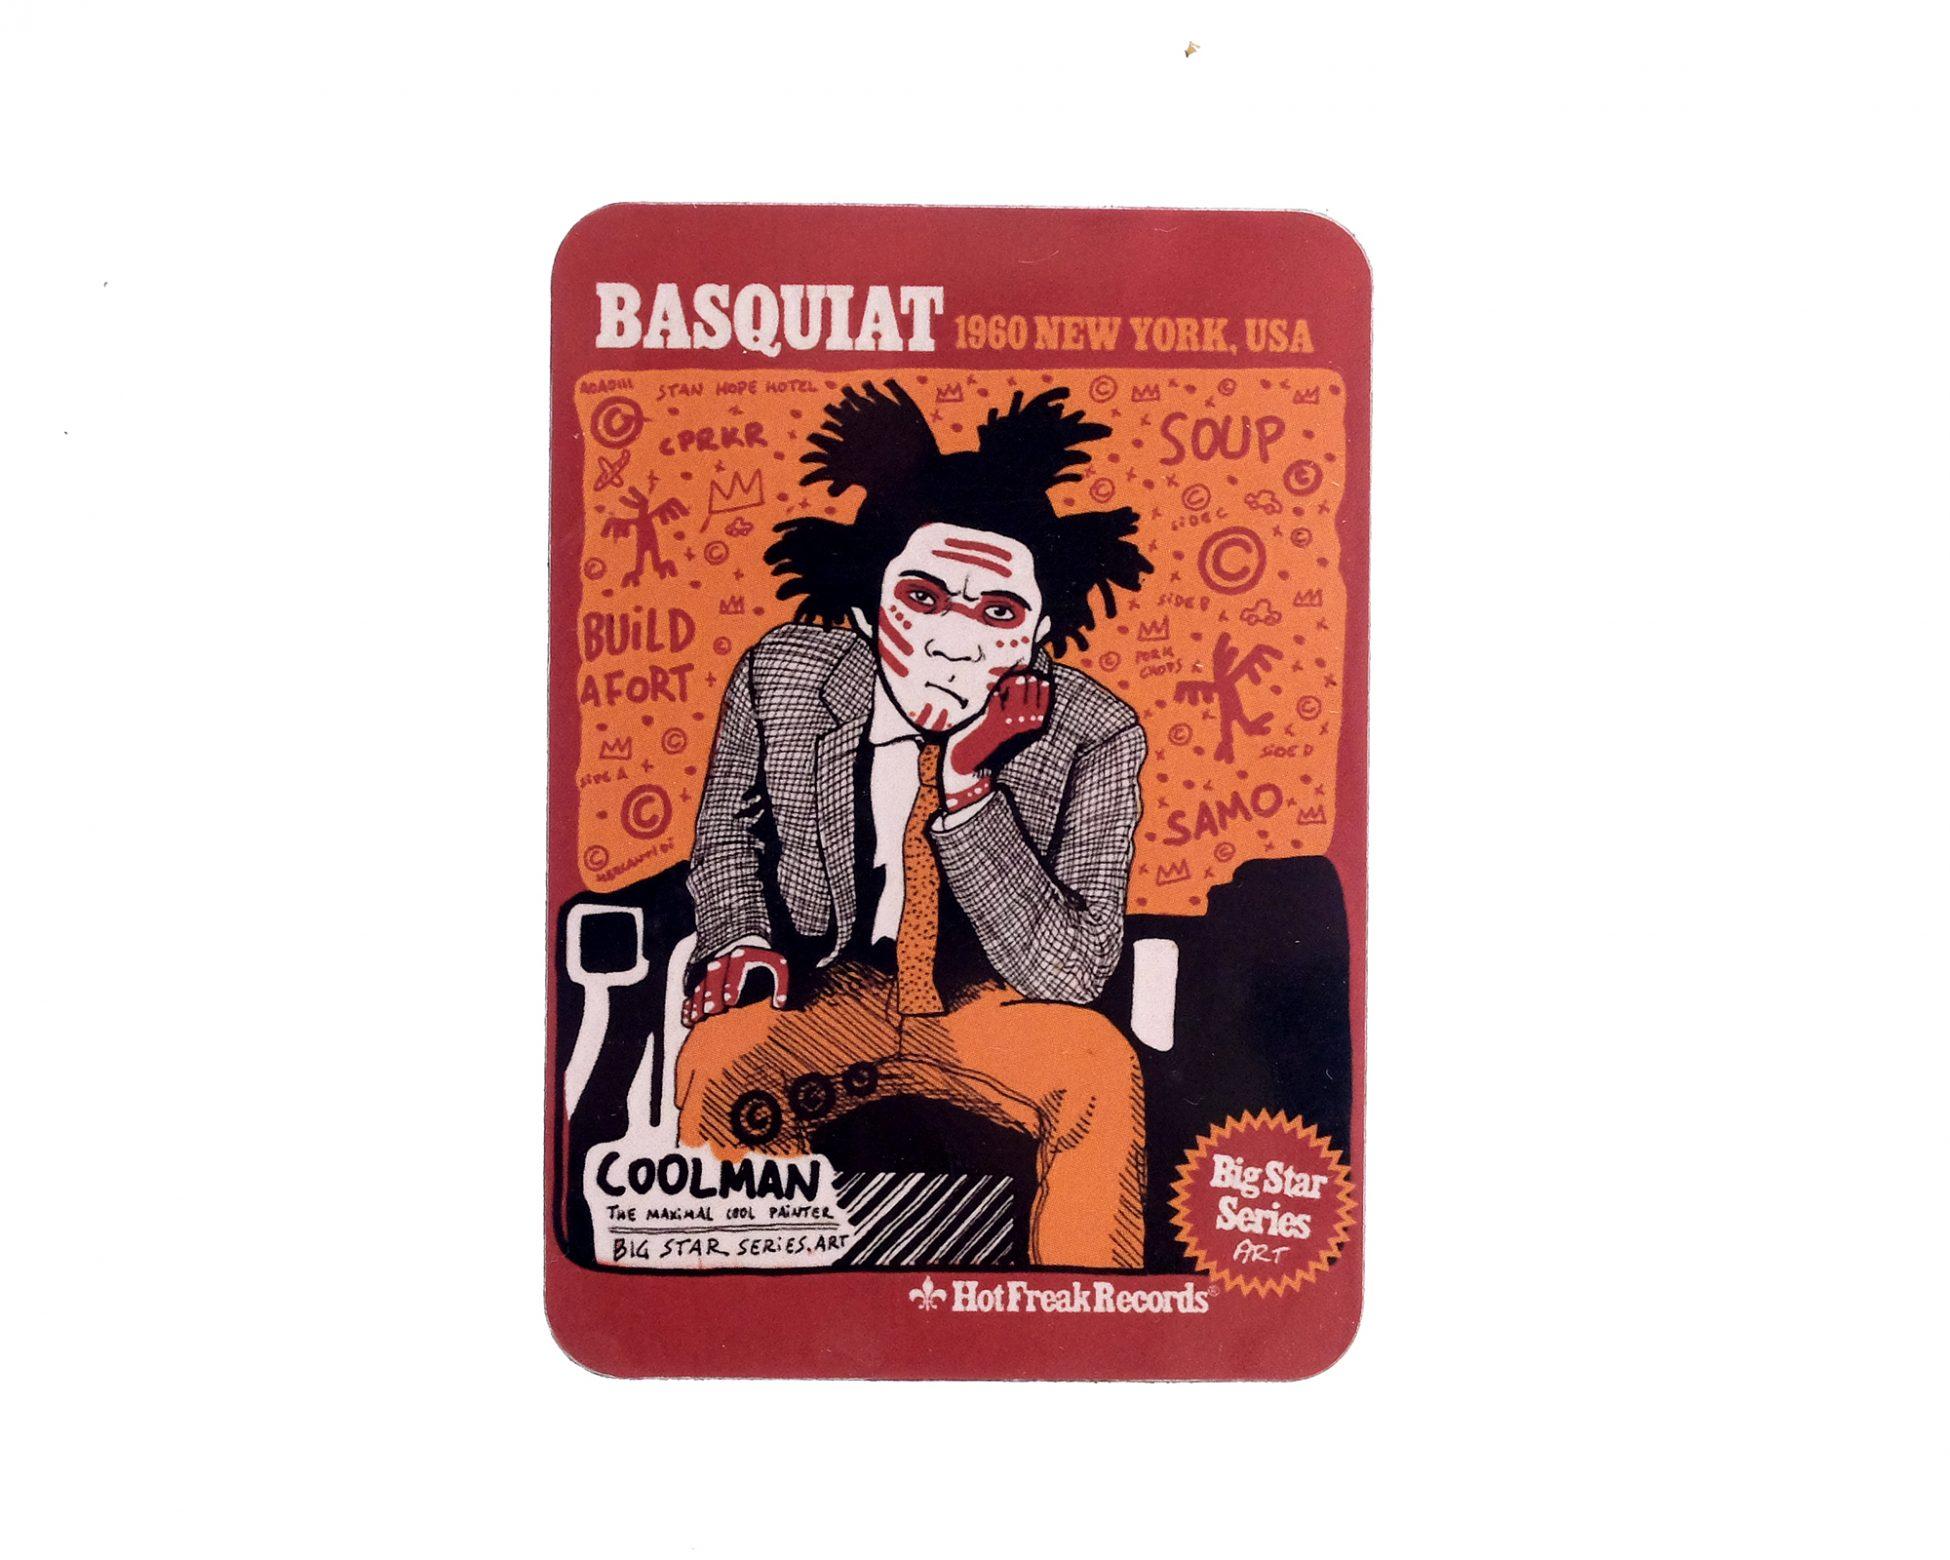 Imán de nevera con un dibujo de un retrato del artista Jean Michel Basquiat. Ilustración de Arte Moderno. Grafitti.